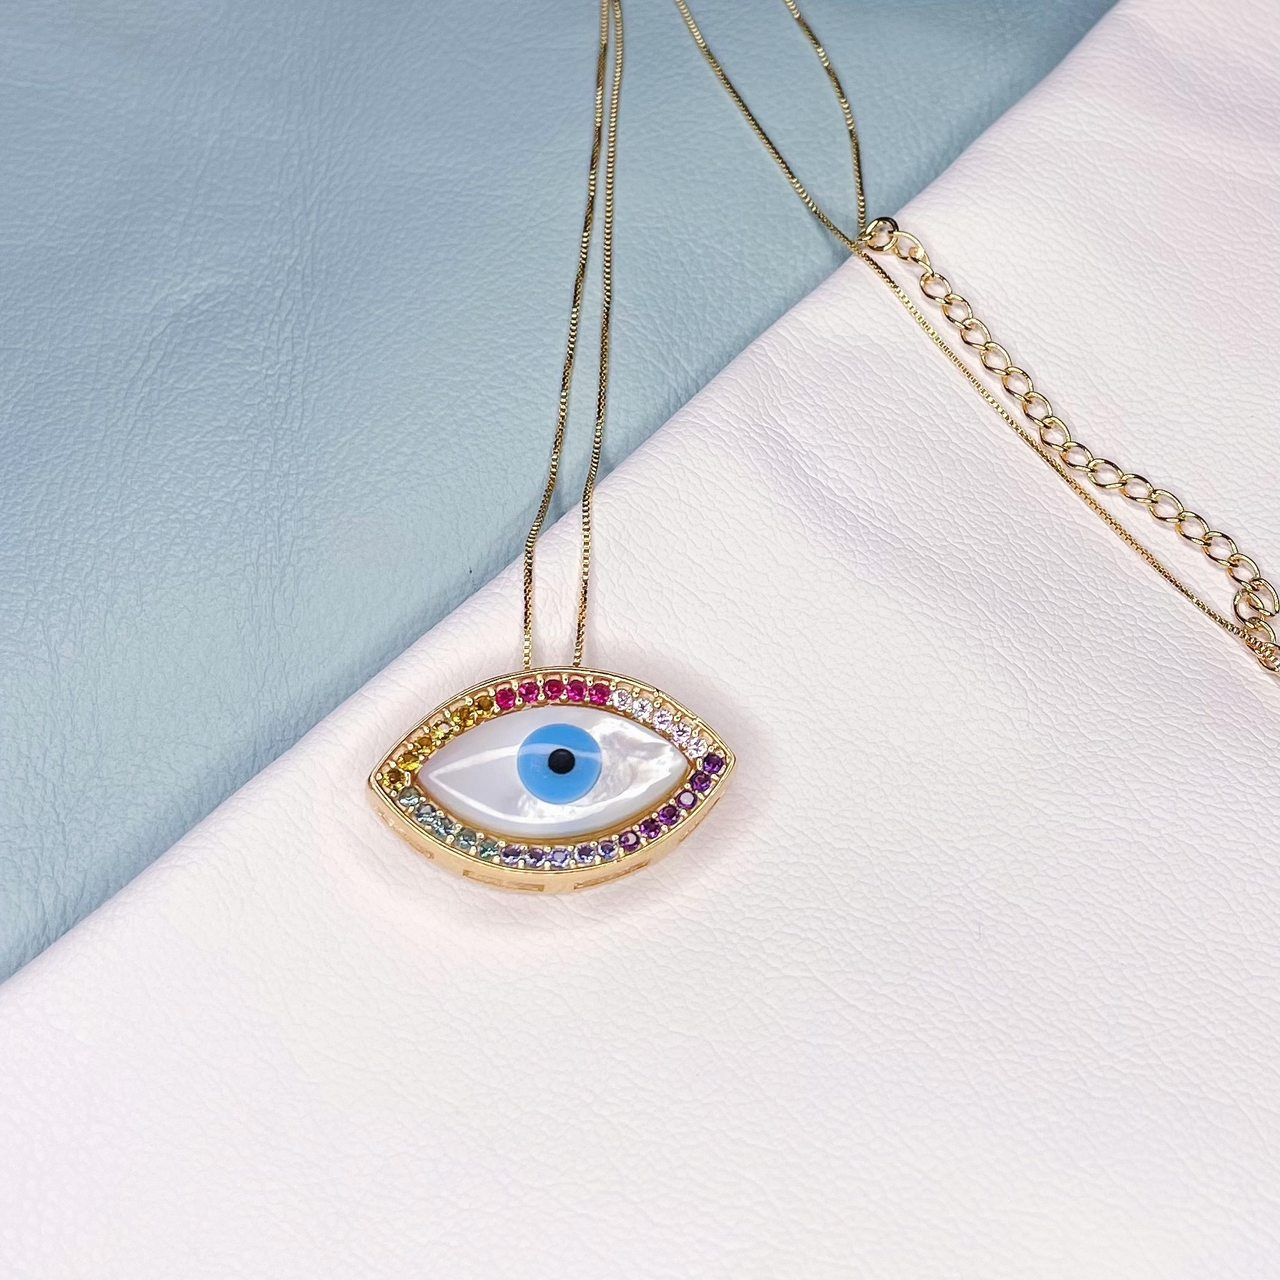 Colar Olho Grego Madre Navete Borda Zirconias Coloridas Banho Ouro